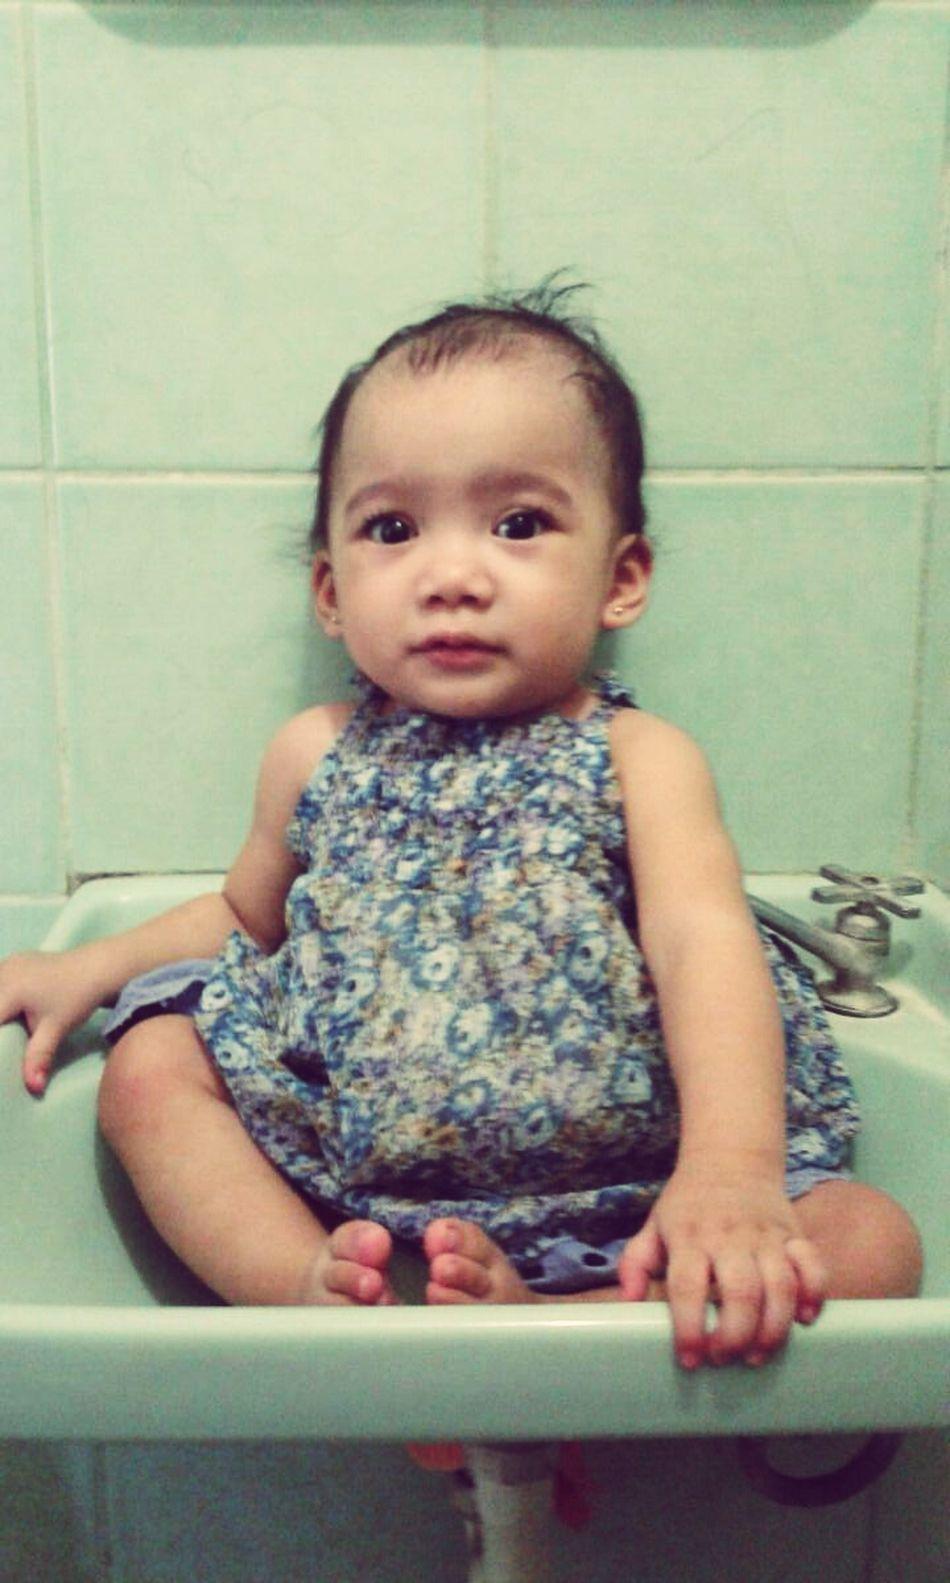 Babygirl Babysitting Baby Sittin Pretty Baby Sitting On The Faucet Over The Faucet Pretty Babygirl Pretty In Dress My Pretty Neice :)